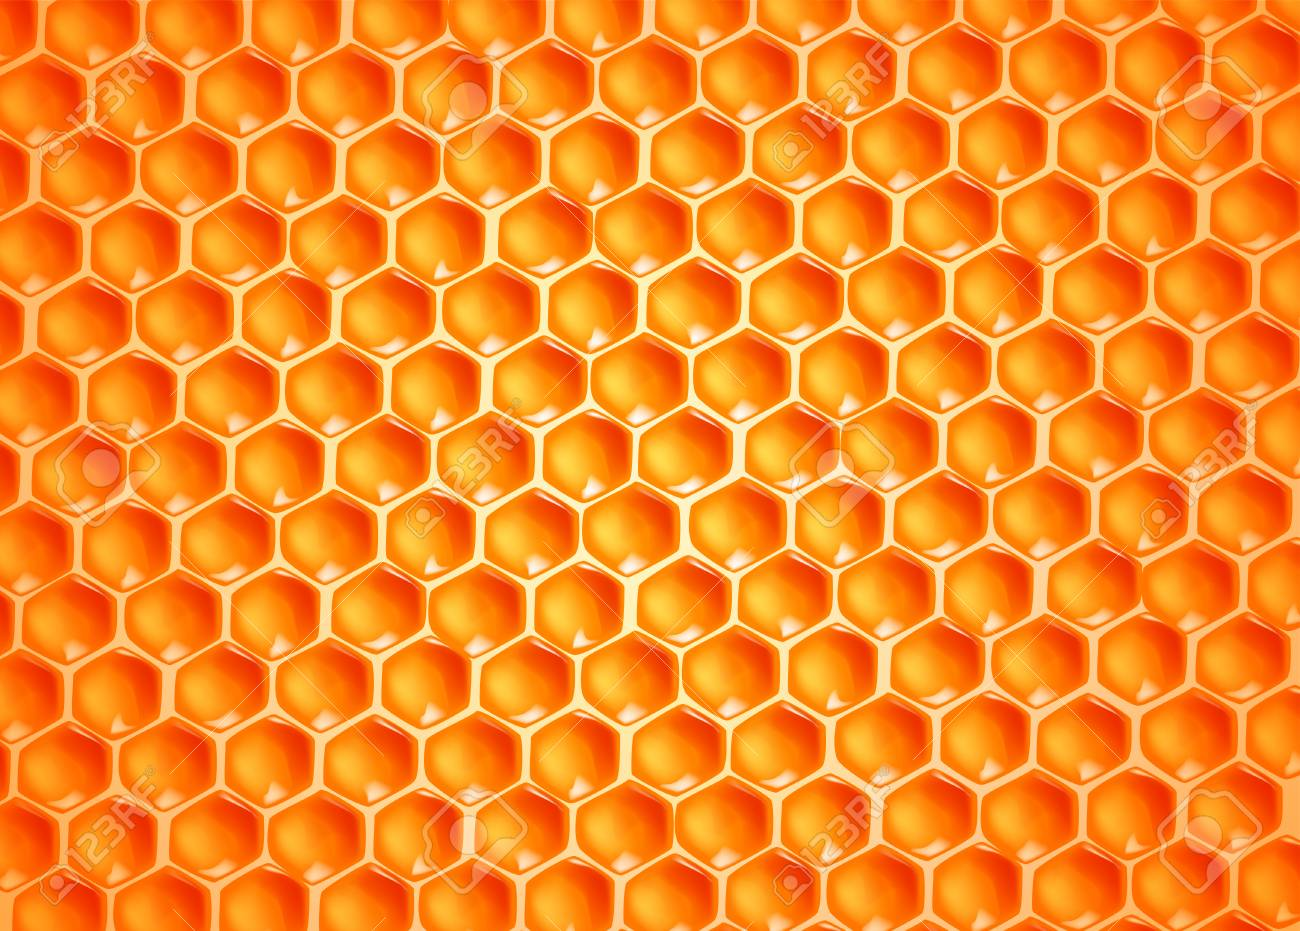 Bee wax cells texture. - 125298576